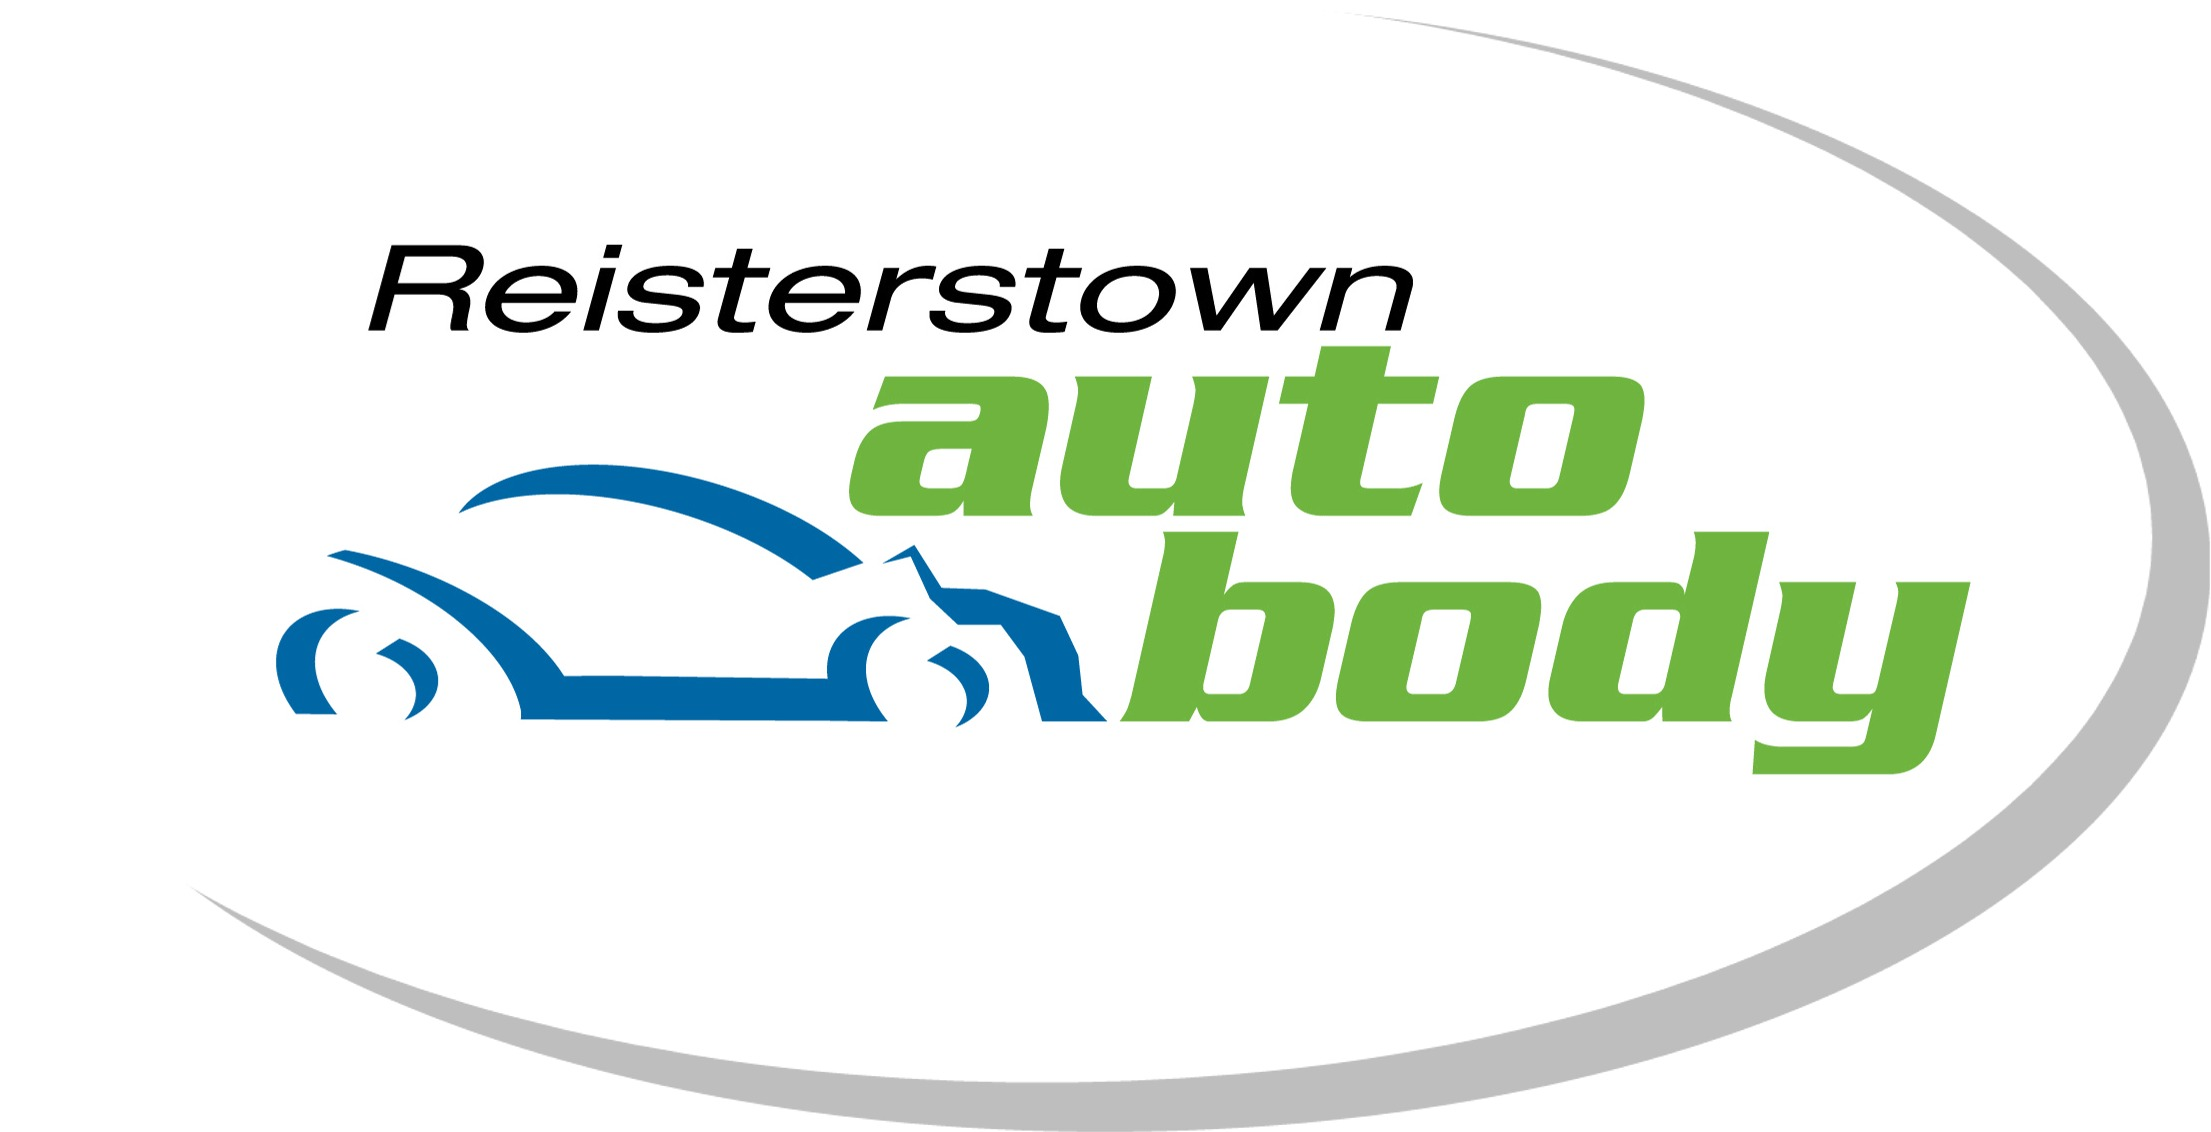 Reisterstown Auto Body - Reisterstown, MD 21136 - (410)833-2271 | ShowMeLocal.com